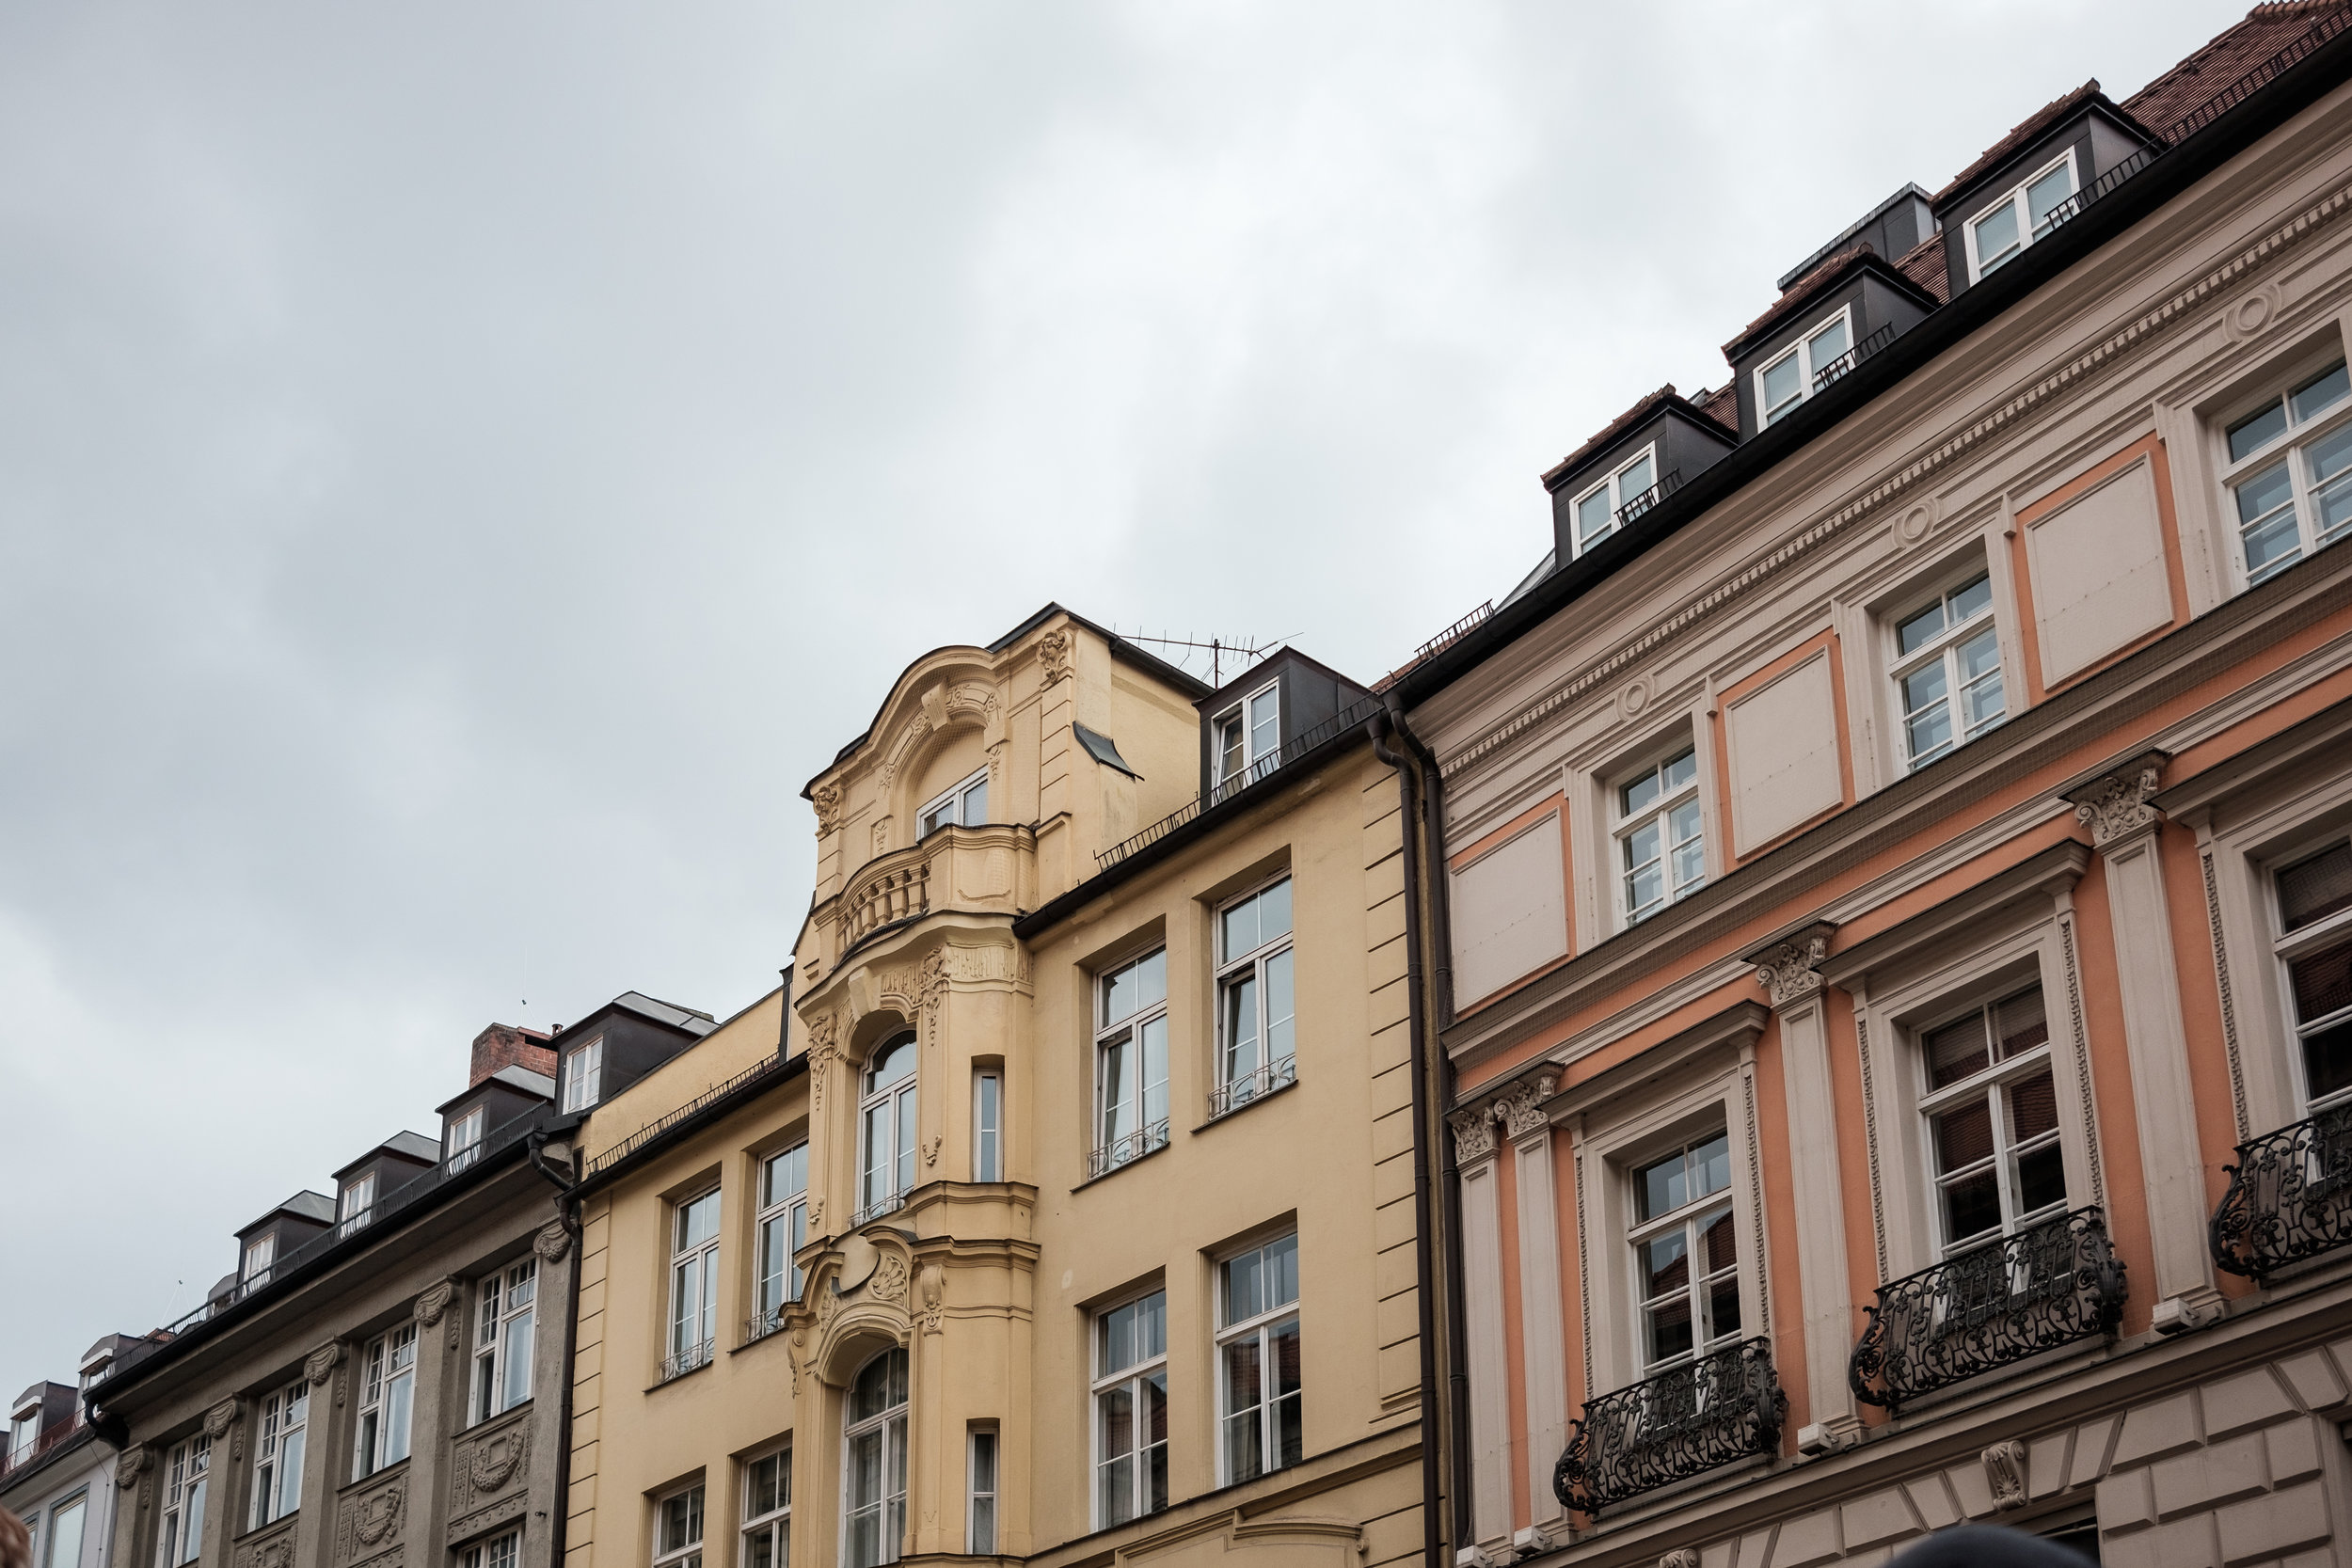 Victoria-Munich-Germany-0108.jpg